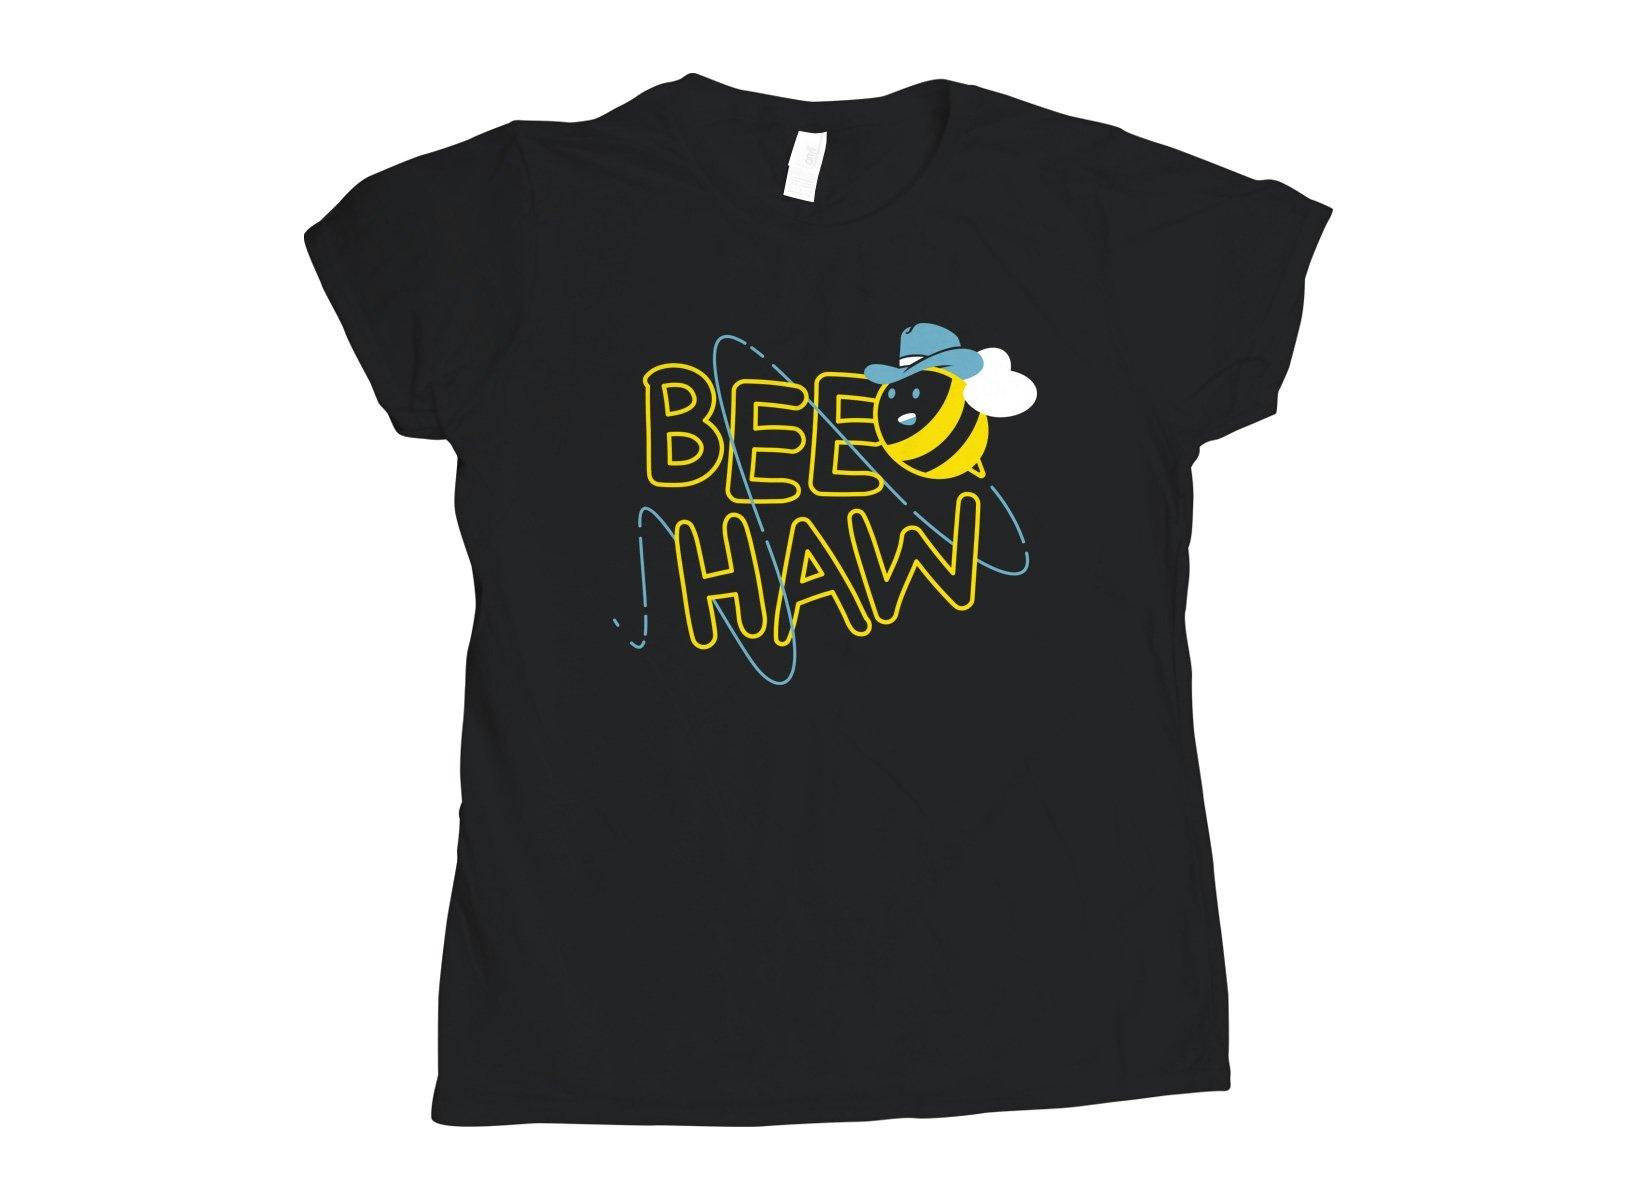 Bee Haw on Womens T-Shirt